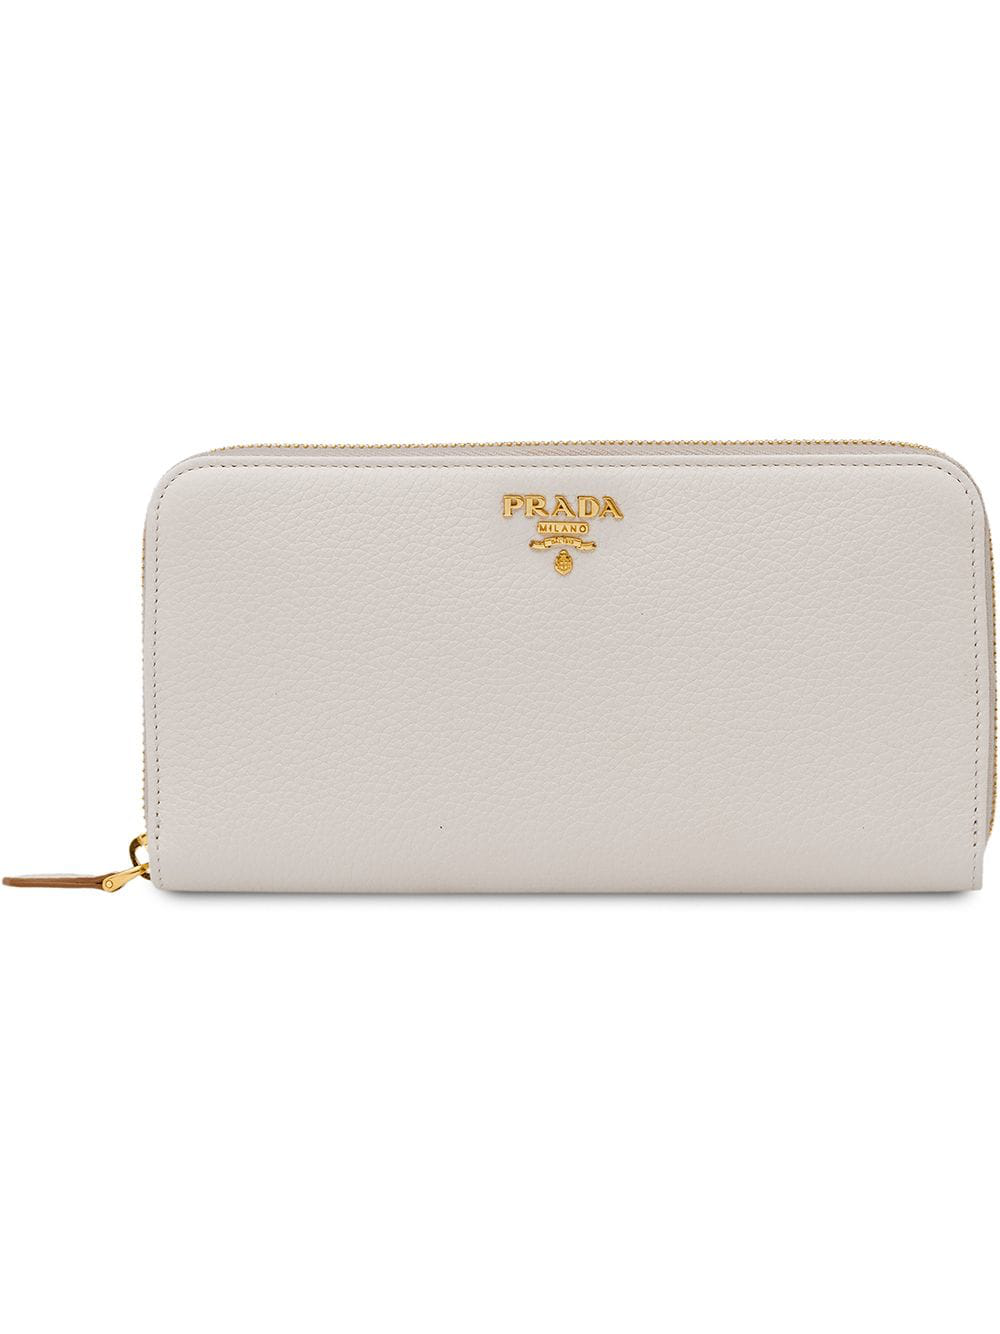 b4521a3d17 Prada Zip Around Wallet - White | ModeSens